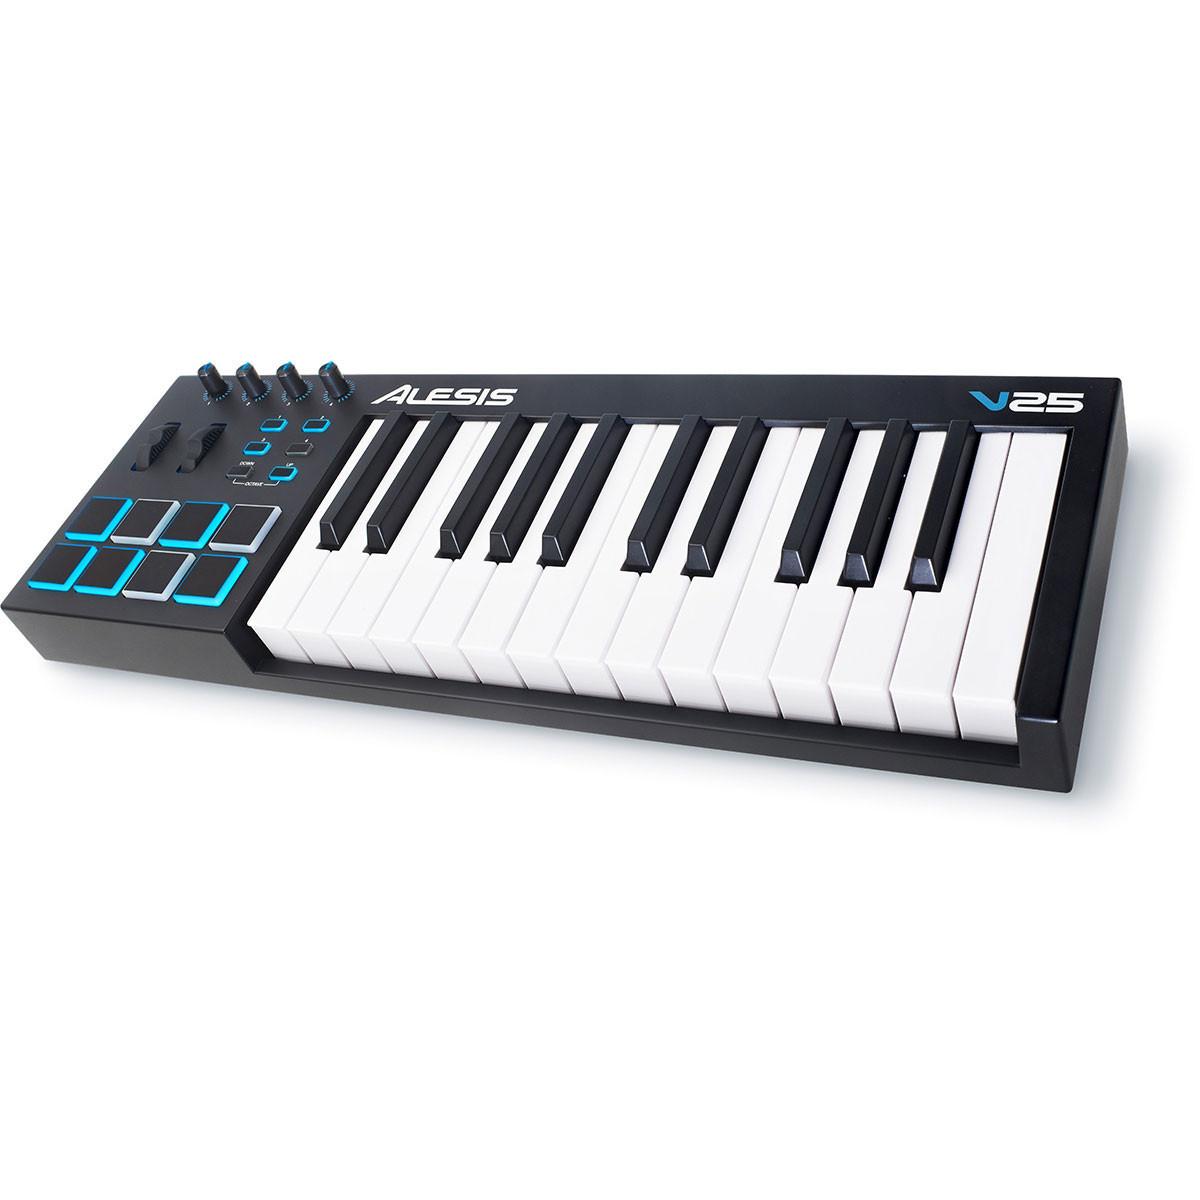 alesis v25 midi keyboard controller trax music store. Black Bedroom Furniture Sets. Home Design Ideas